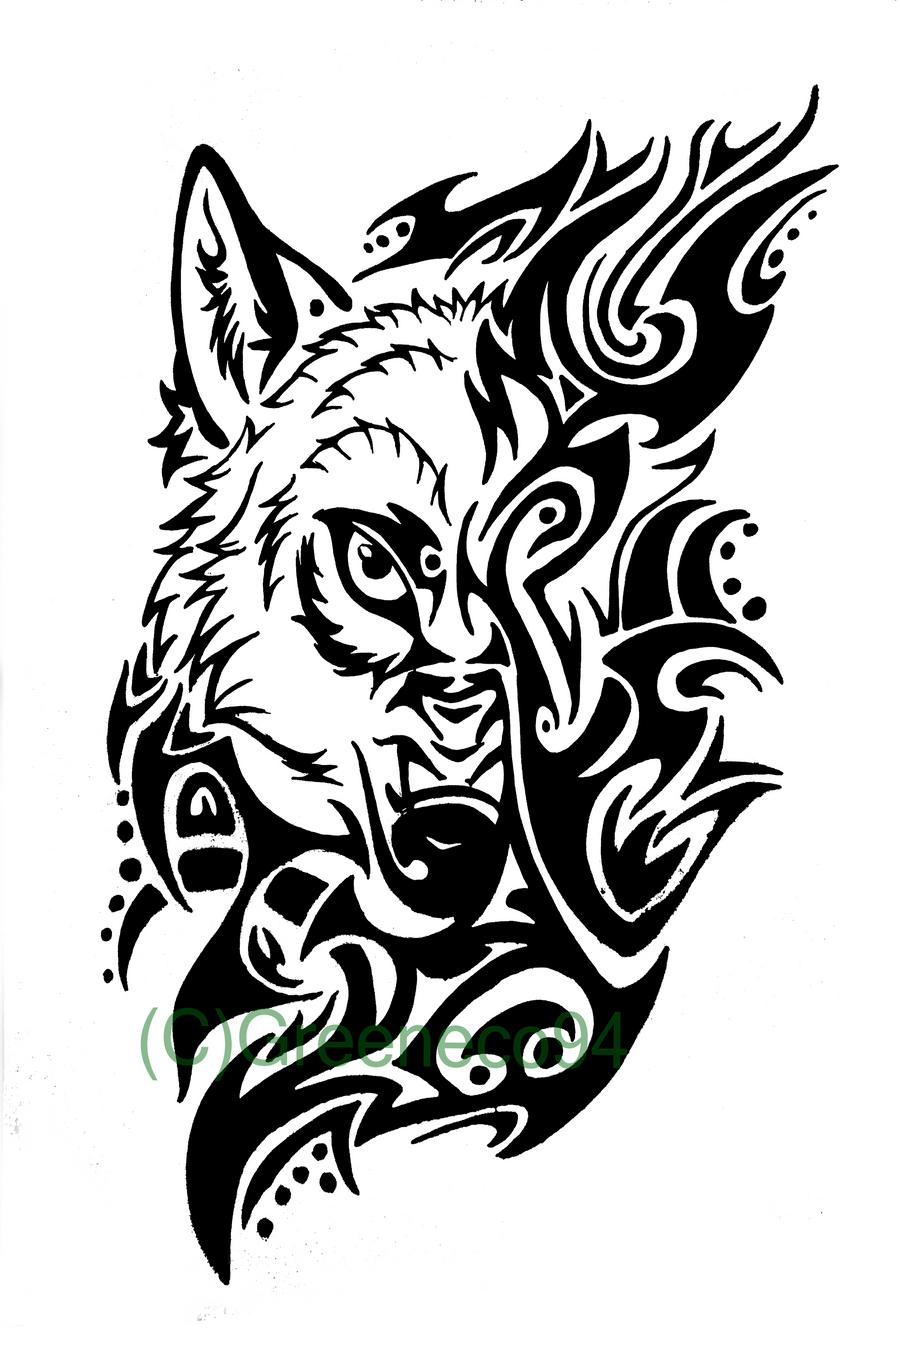 A Wolf Tribal Tattoo By GreenEco94 On DeviantArt